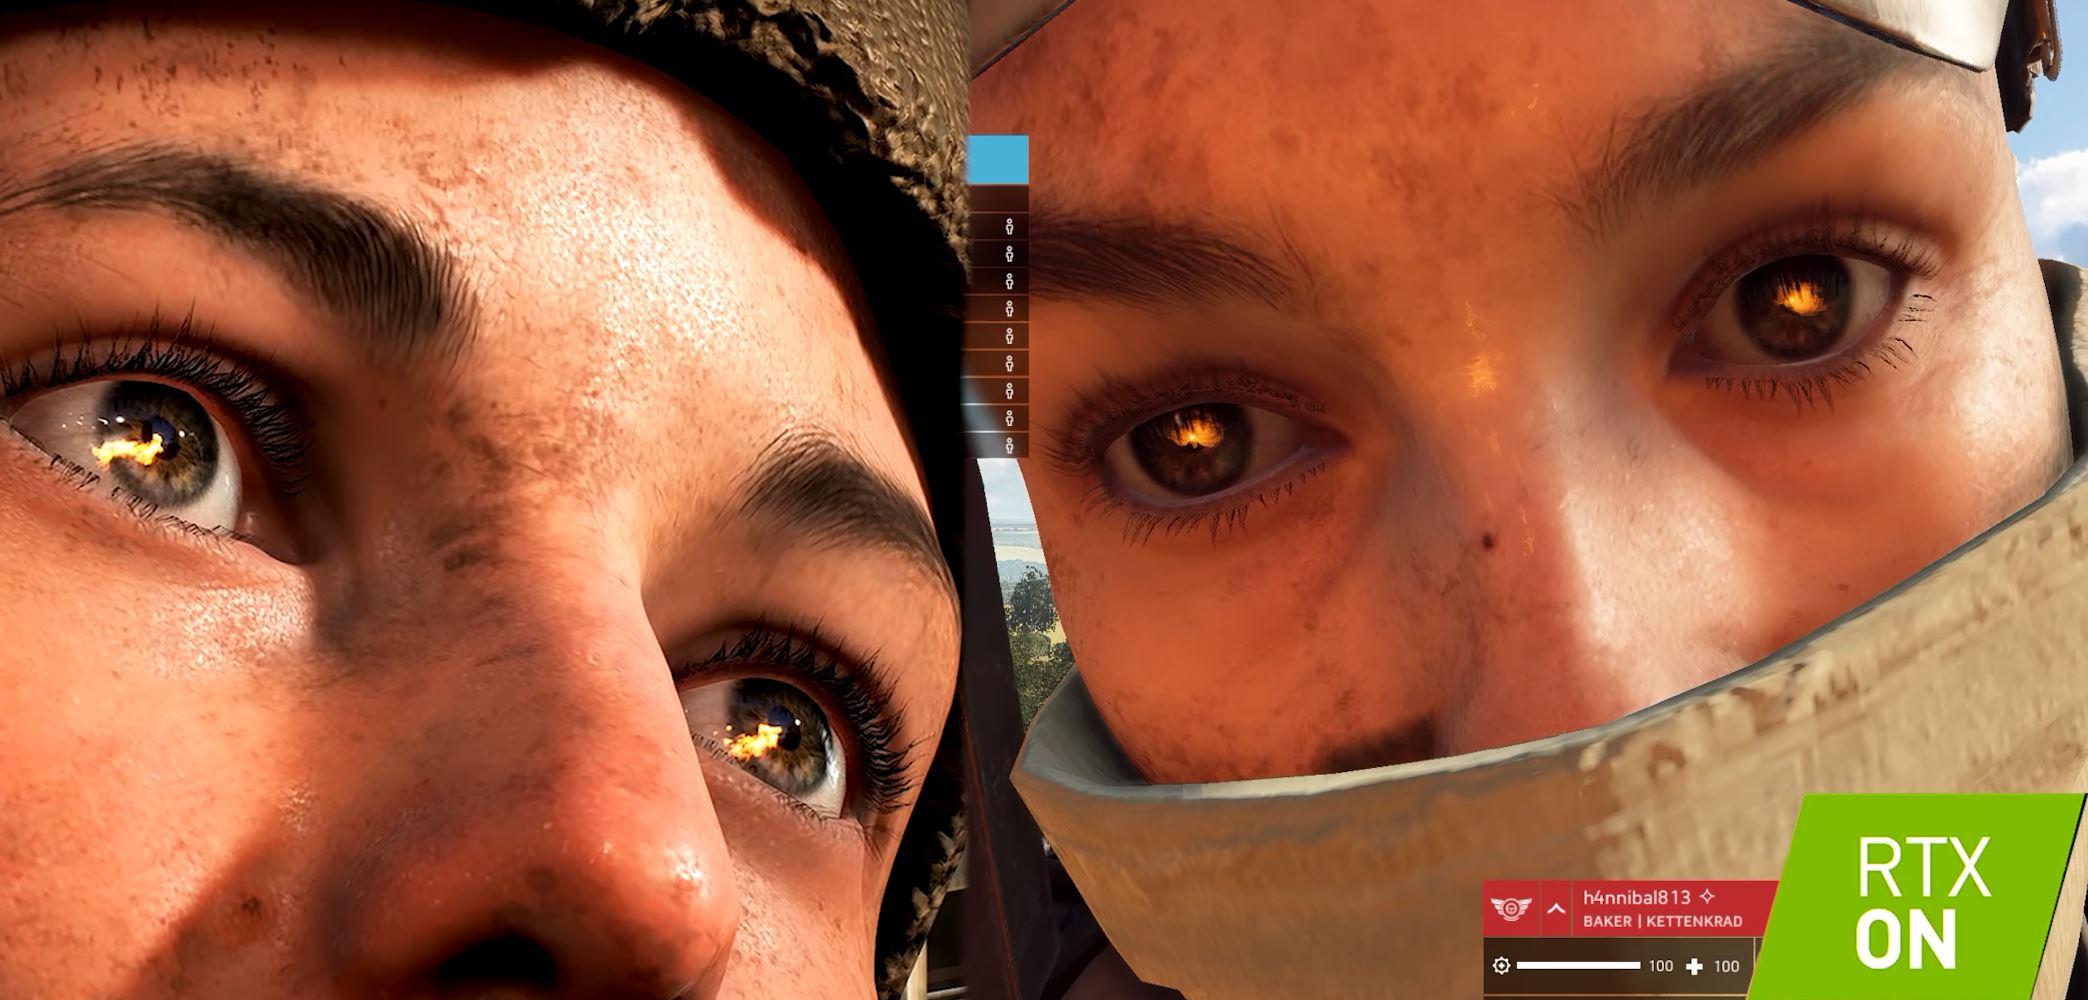 RTX Reflections on eyes